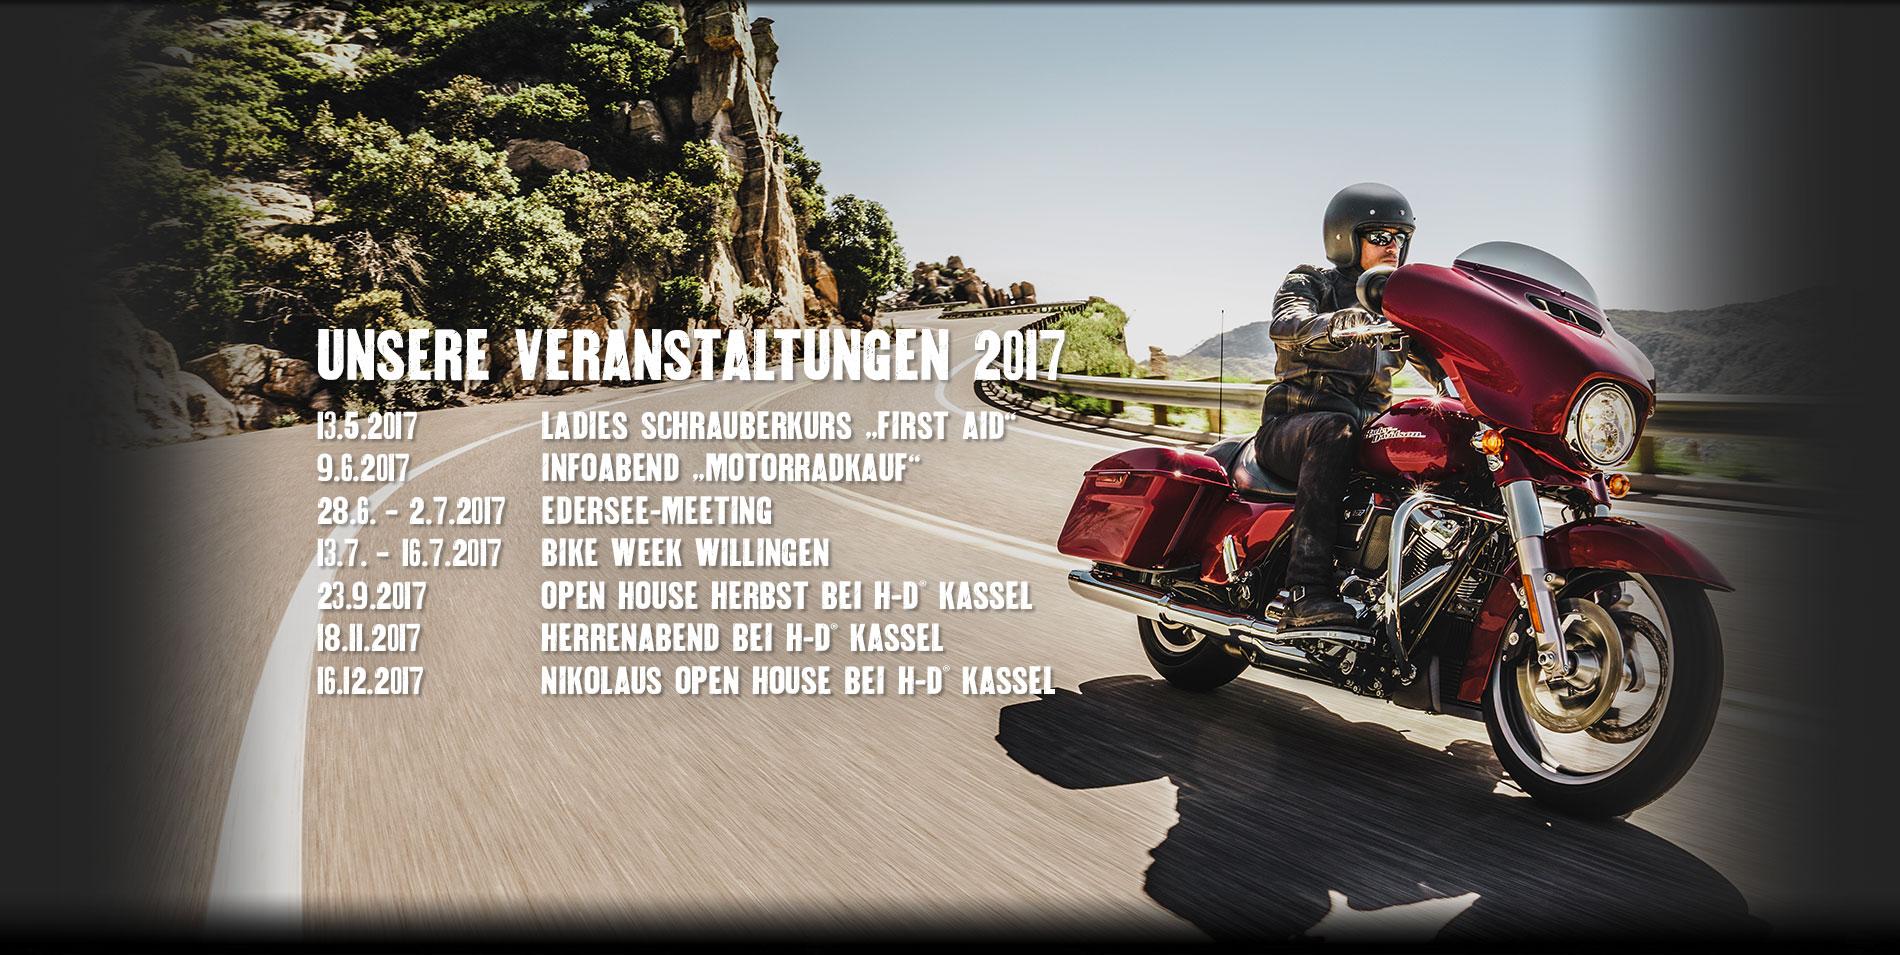 HD_Kassel_Website_Billboard_Veranstaltungen2017